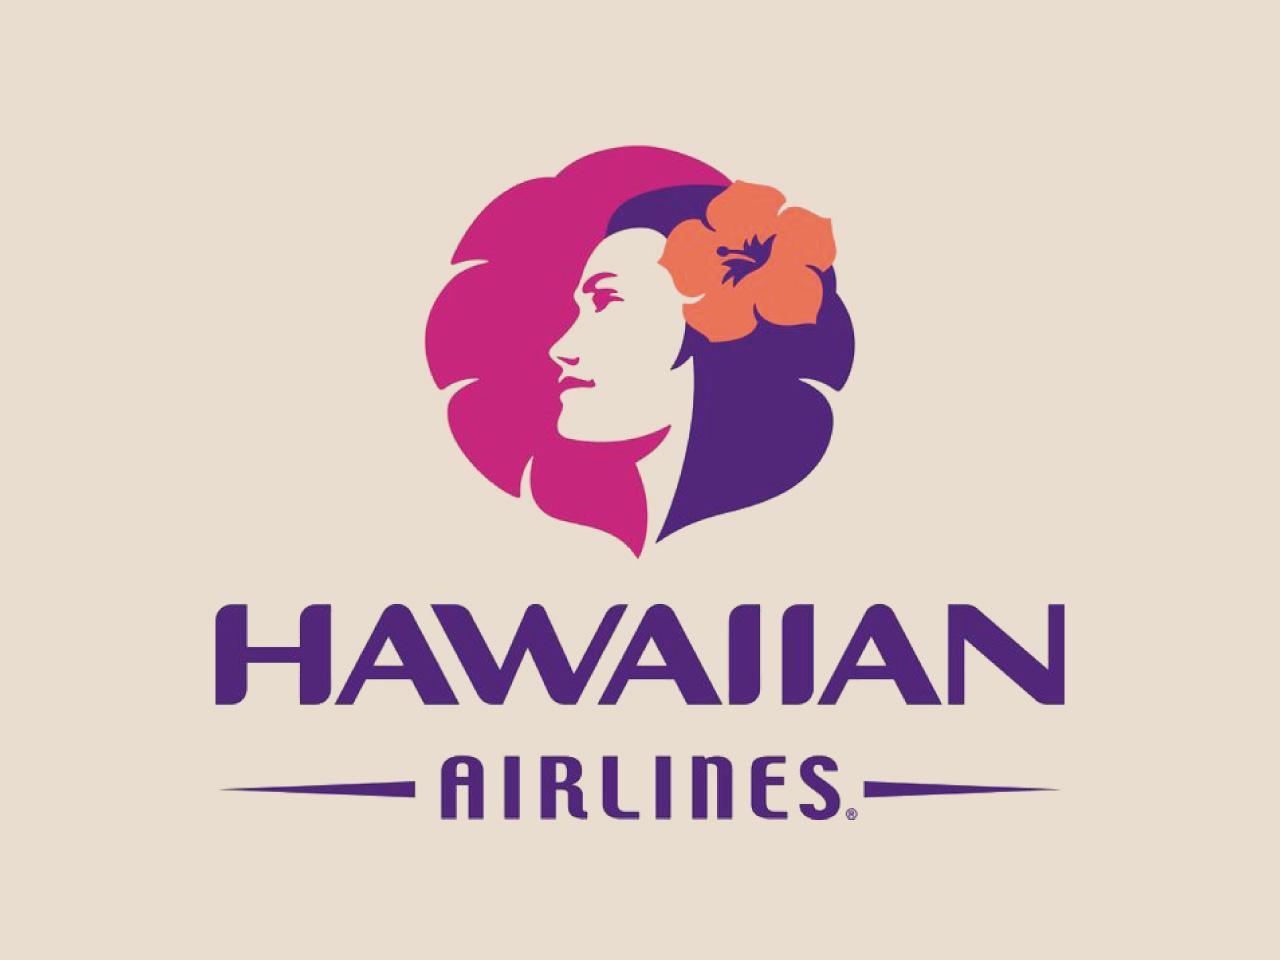 Maui-Beachfront-Vacation-Rentals-Hawaiian-Airlines.jpg